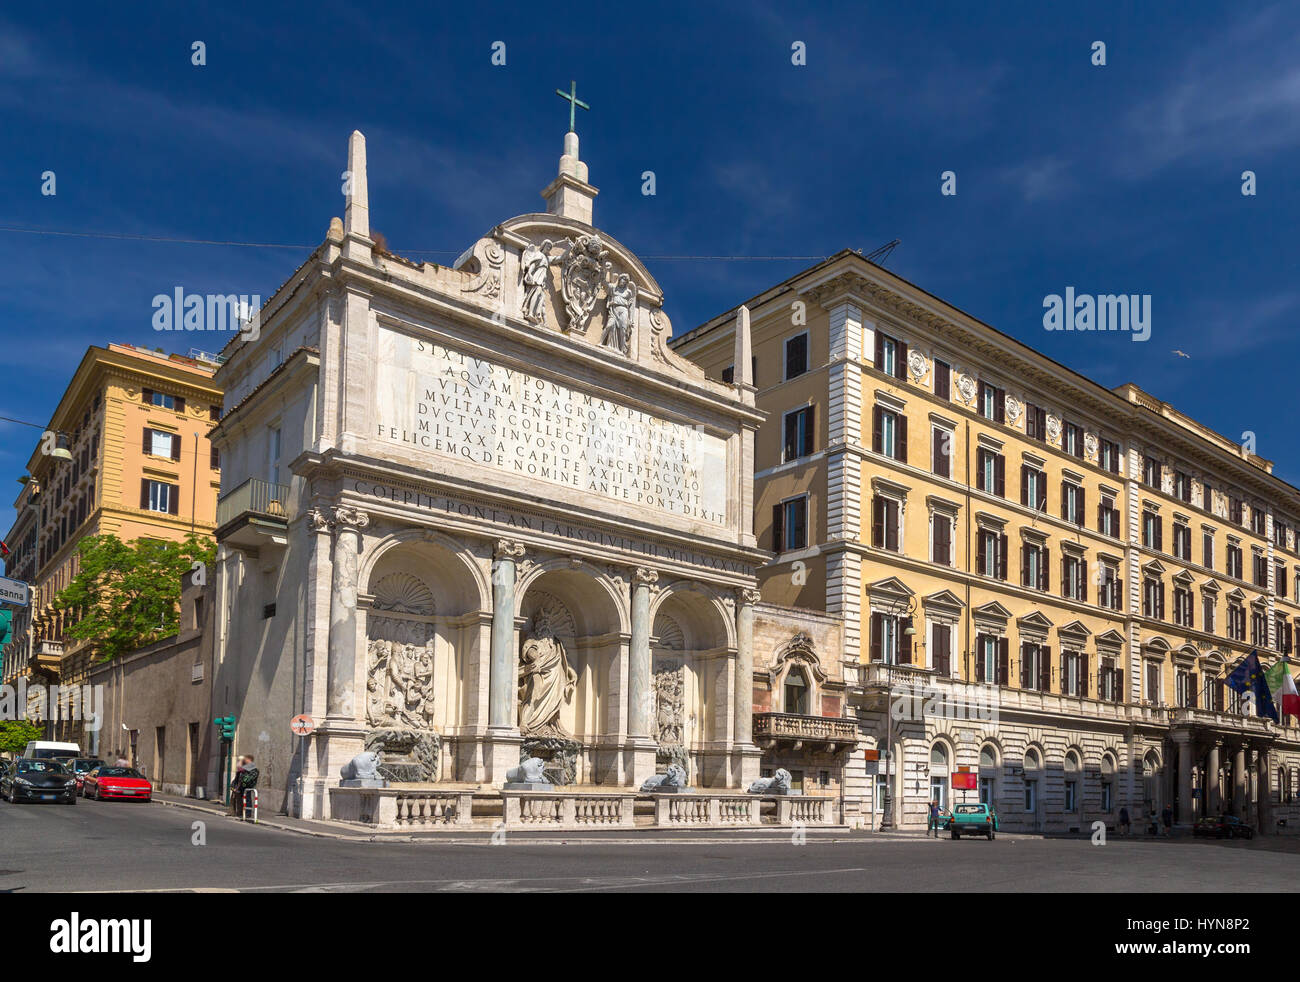 Fontana dell'Acqua Felice in Rome, Italy - Stock Image